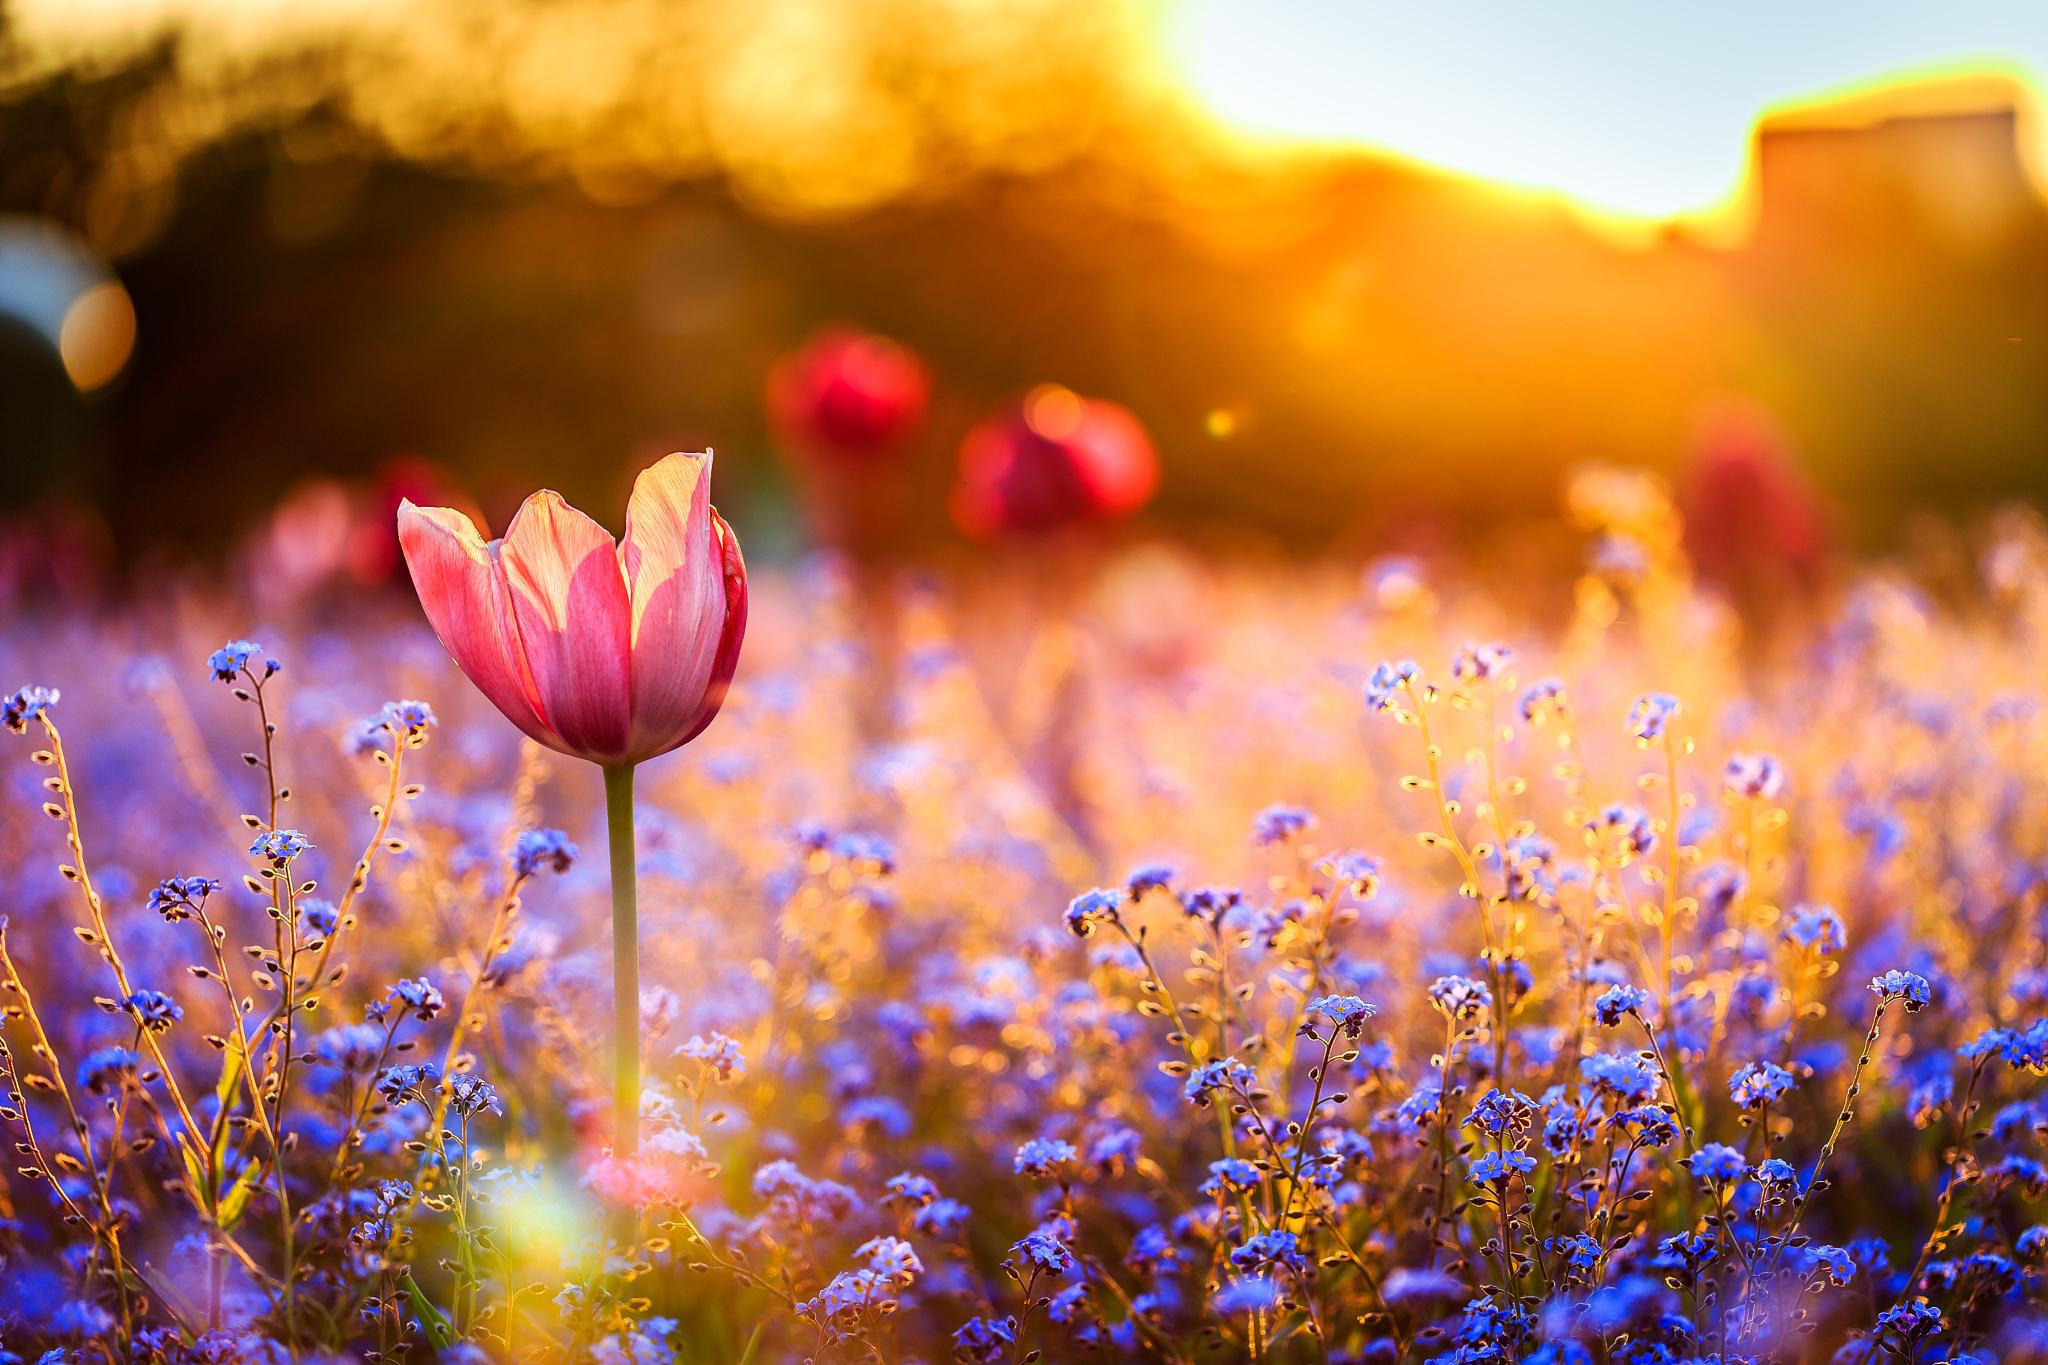 Spring Sunset Mood Papel De Parede Hd Plano De Fundo 2048x1365 Id 680491 Wallpaper Abyss